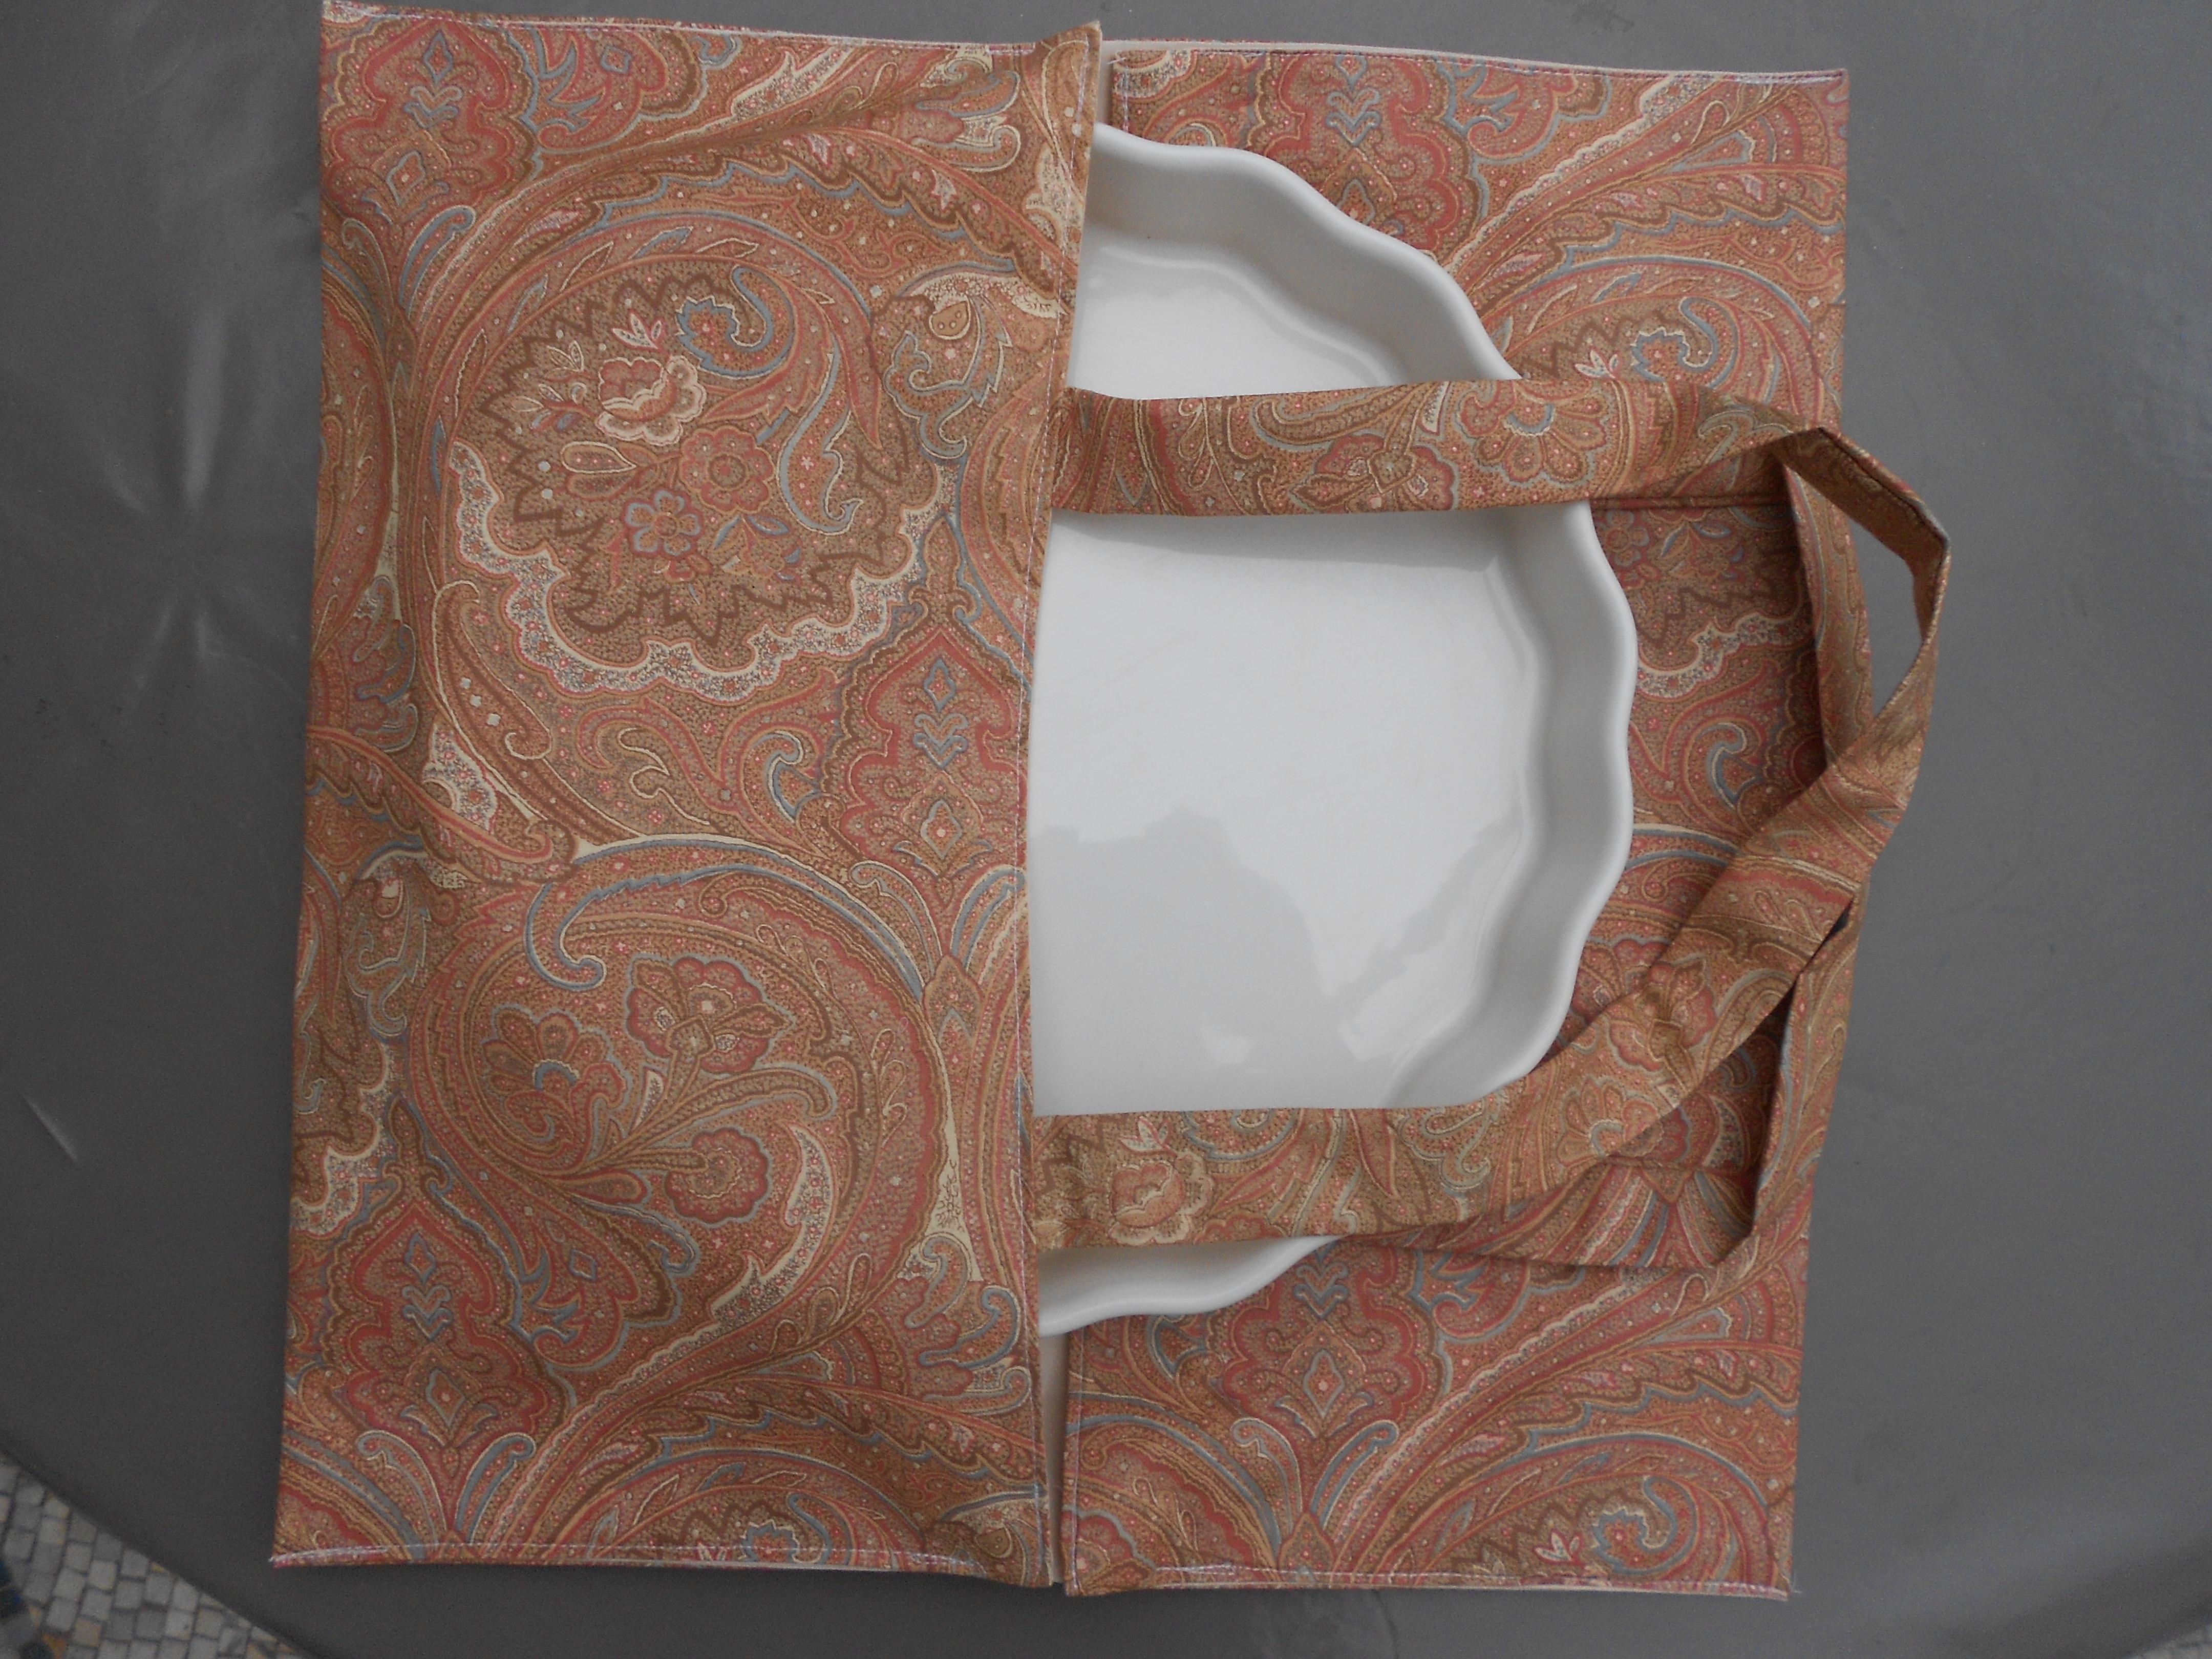 Sac porte plat tarte motifs cachemire maison et deco - Porte tarte en tissu ...